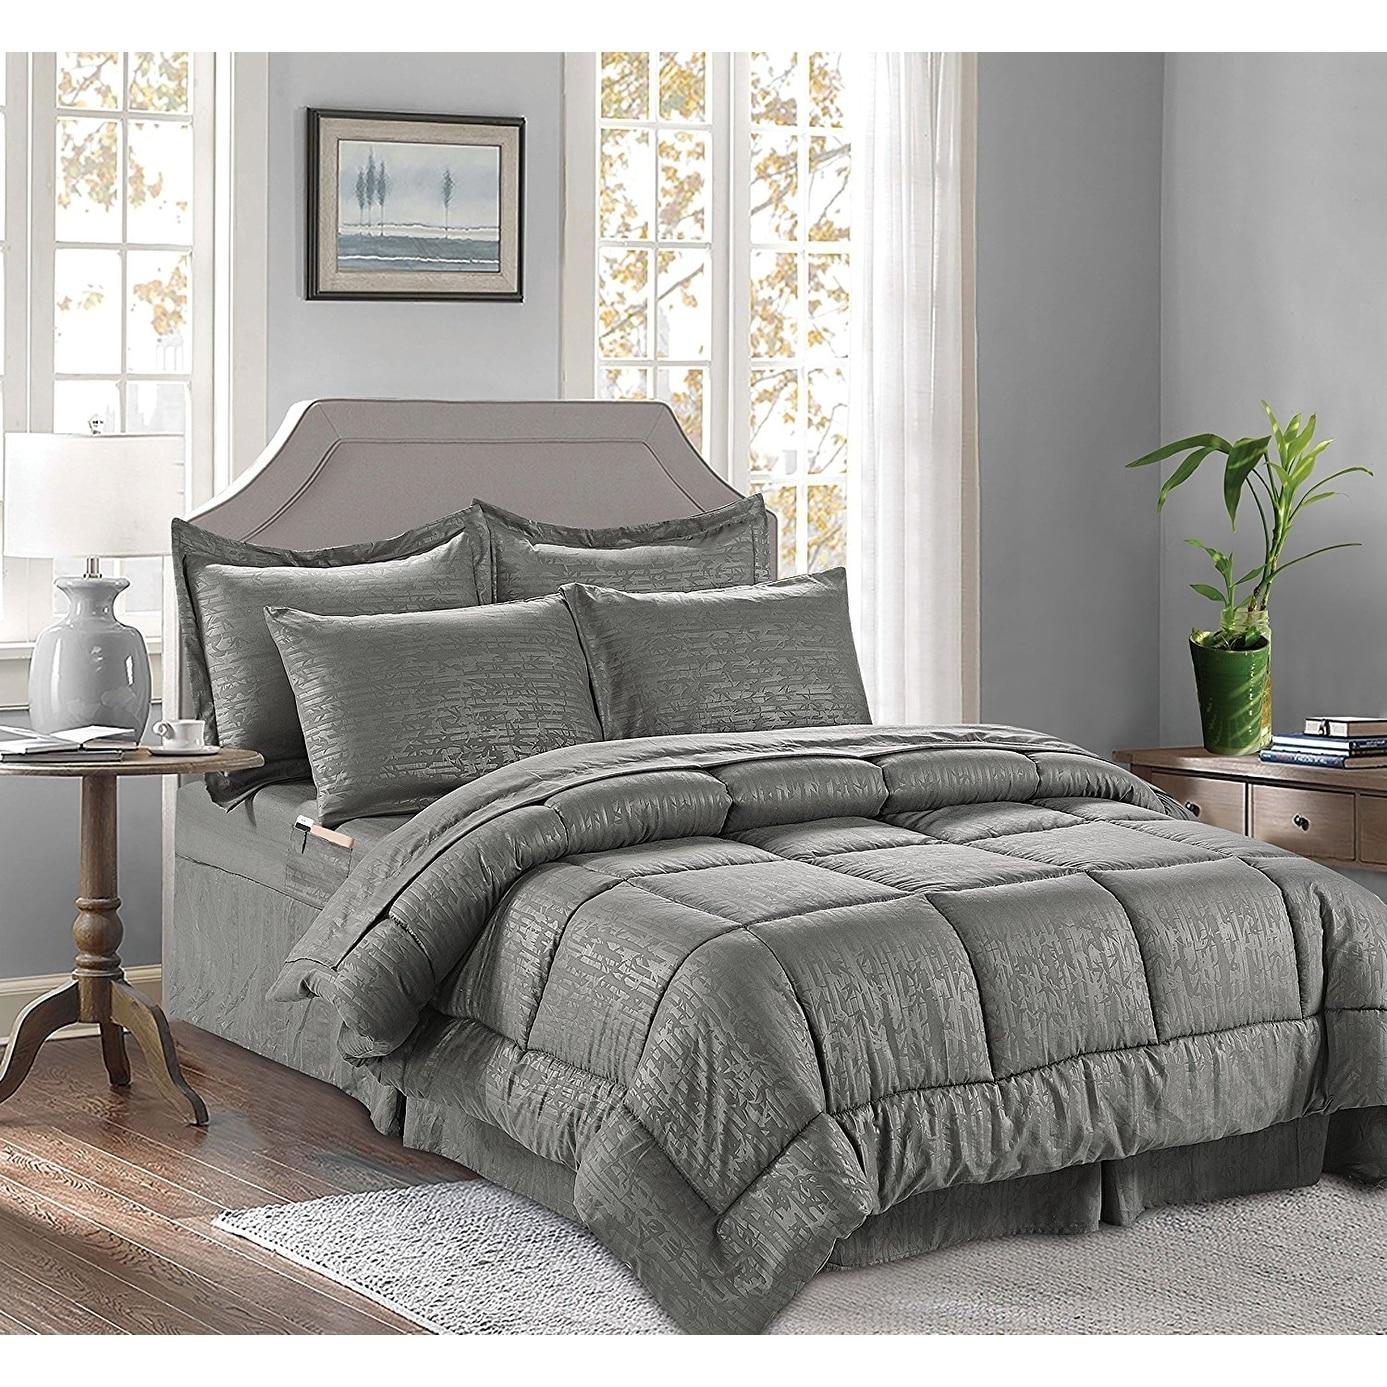 Double Full Light Blue Bamboo 6 Piece Bedding Super Soft Wrinkle Free Sheet Set